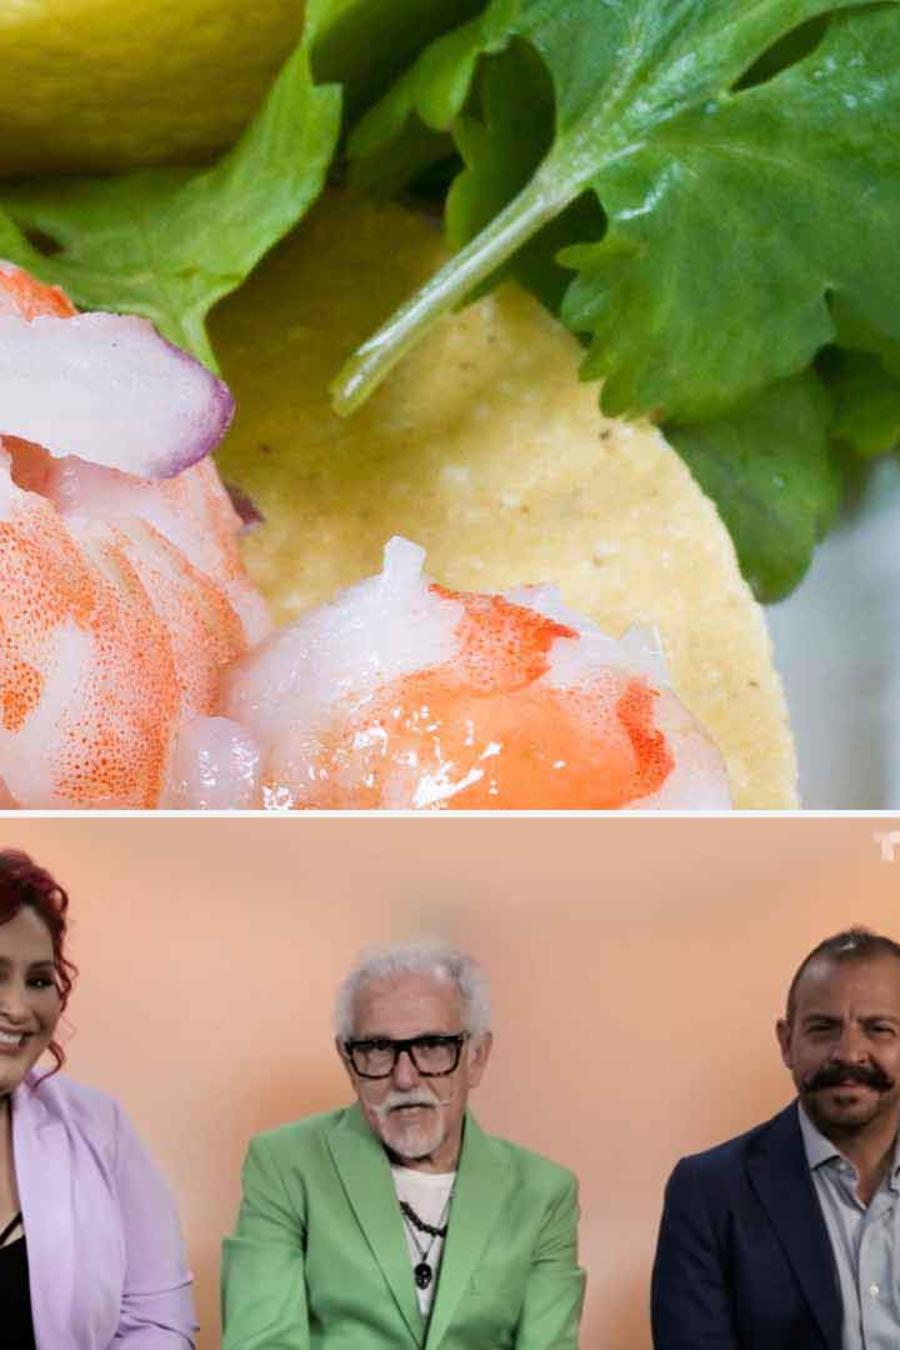 Entrevista a jueces de Master Chef